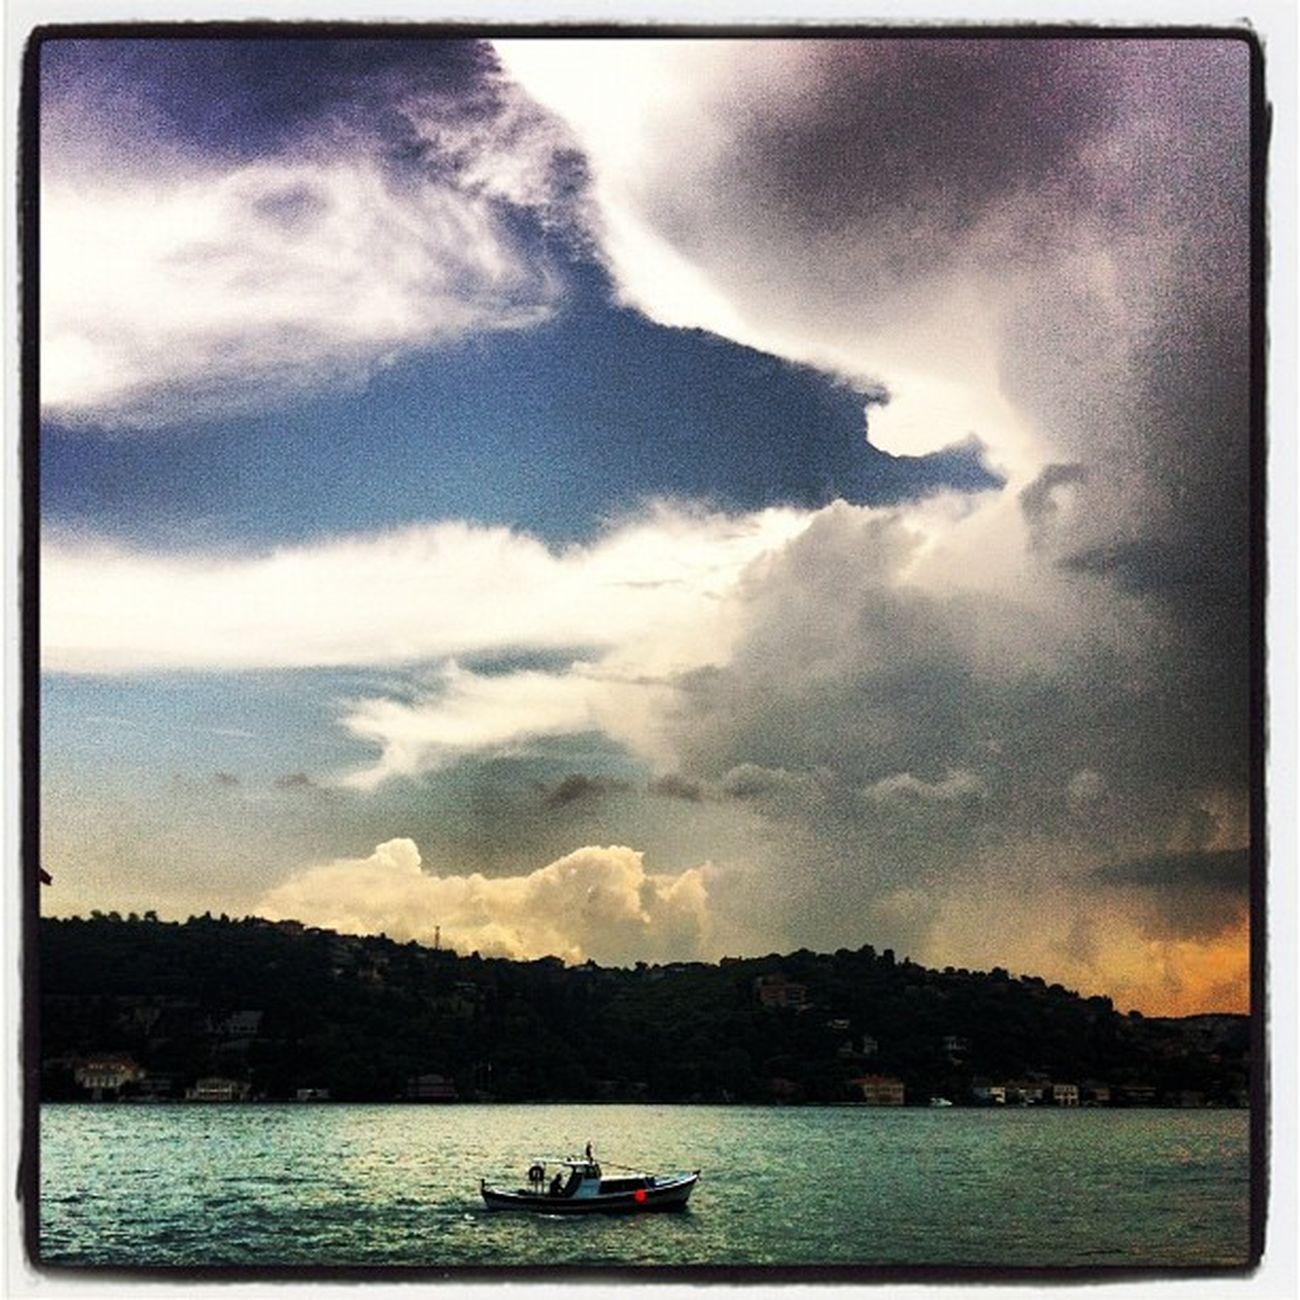 Igersturkey I ̇stanbul Istanbulove Instagram instagood instamood photooftheday